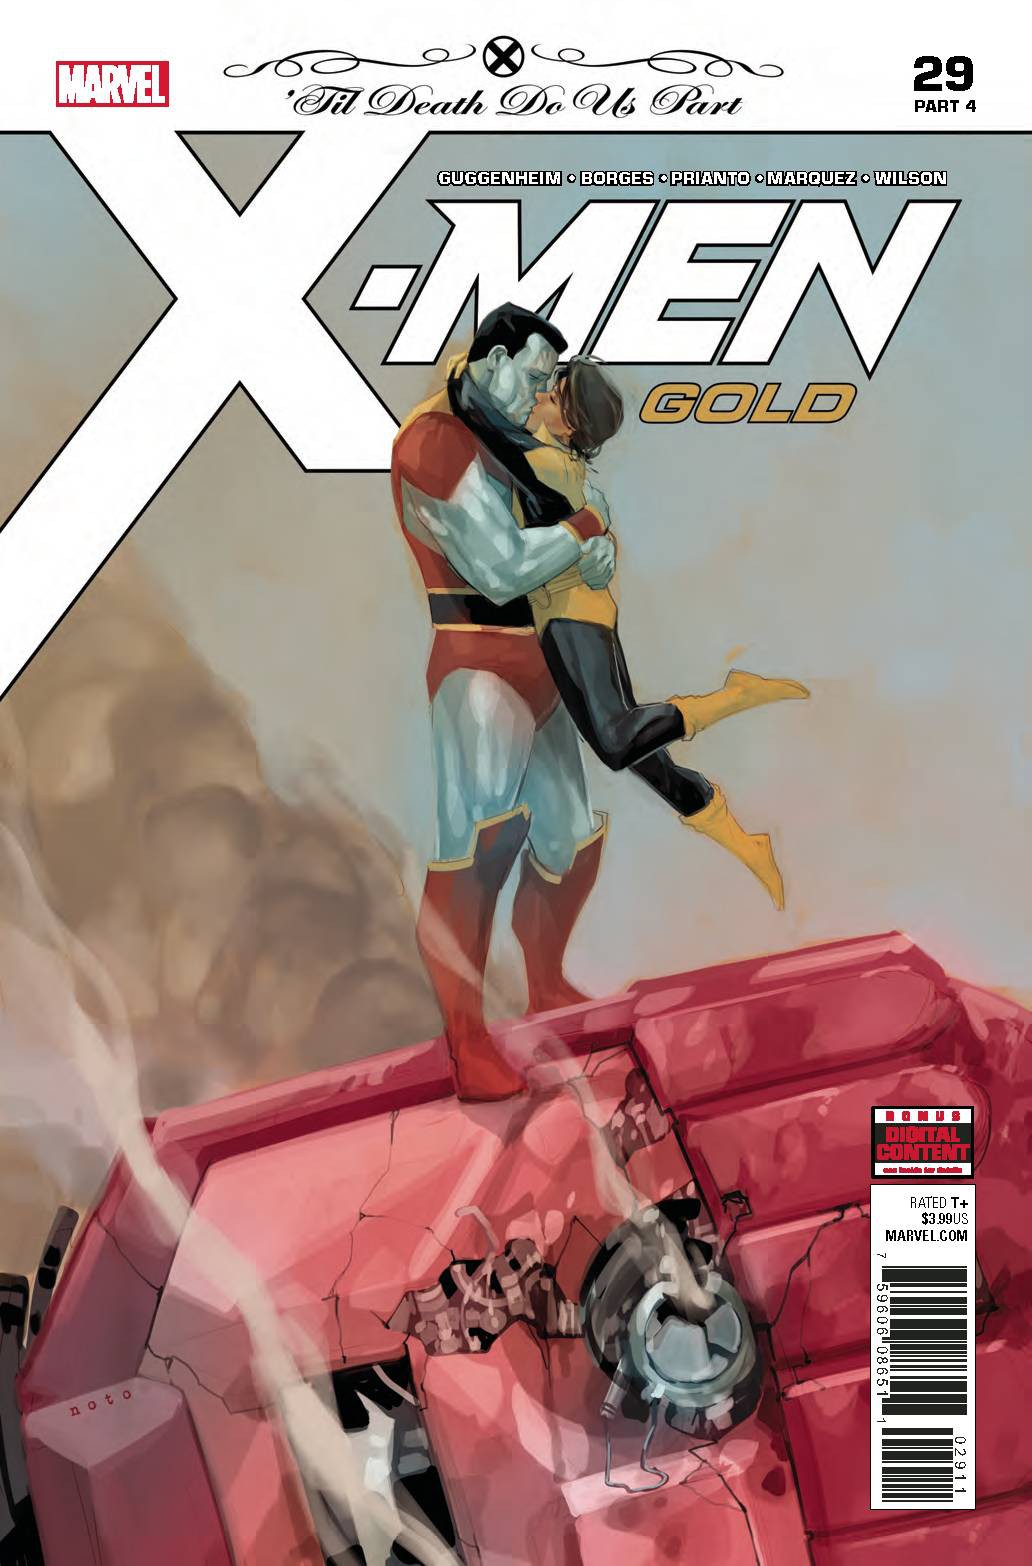 Marvel X-Men Gold #29 by